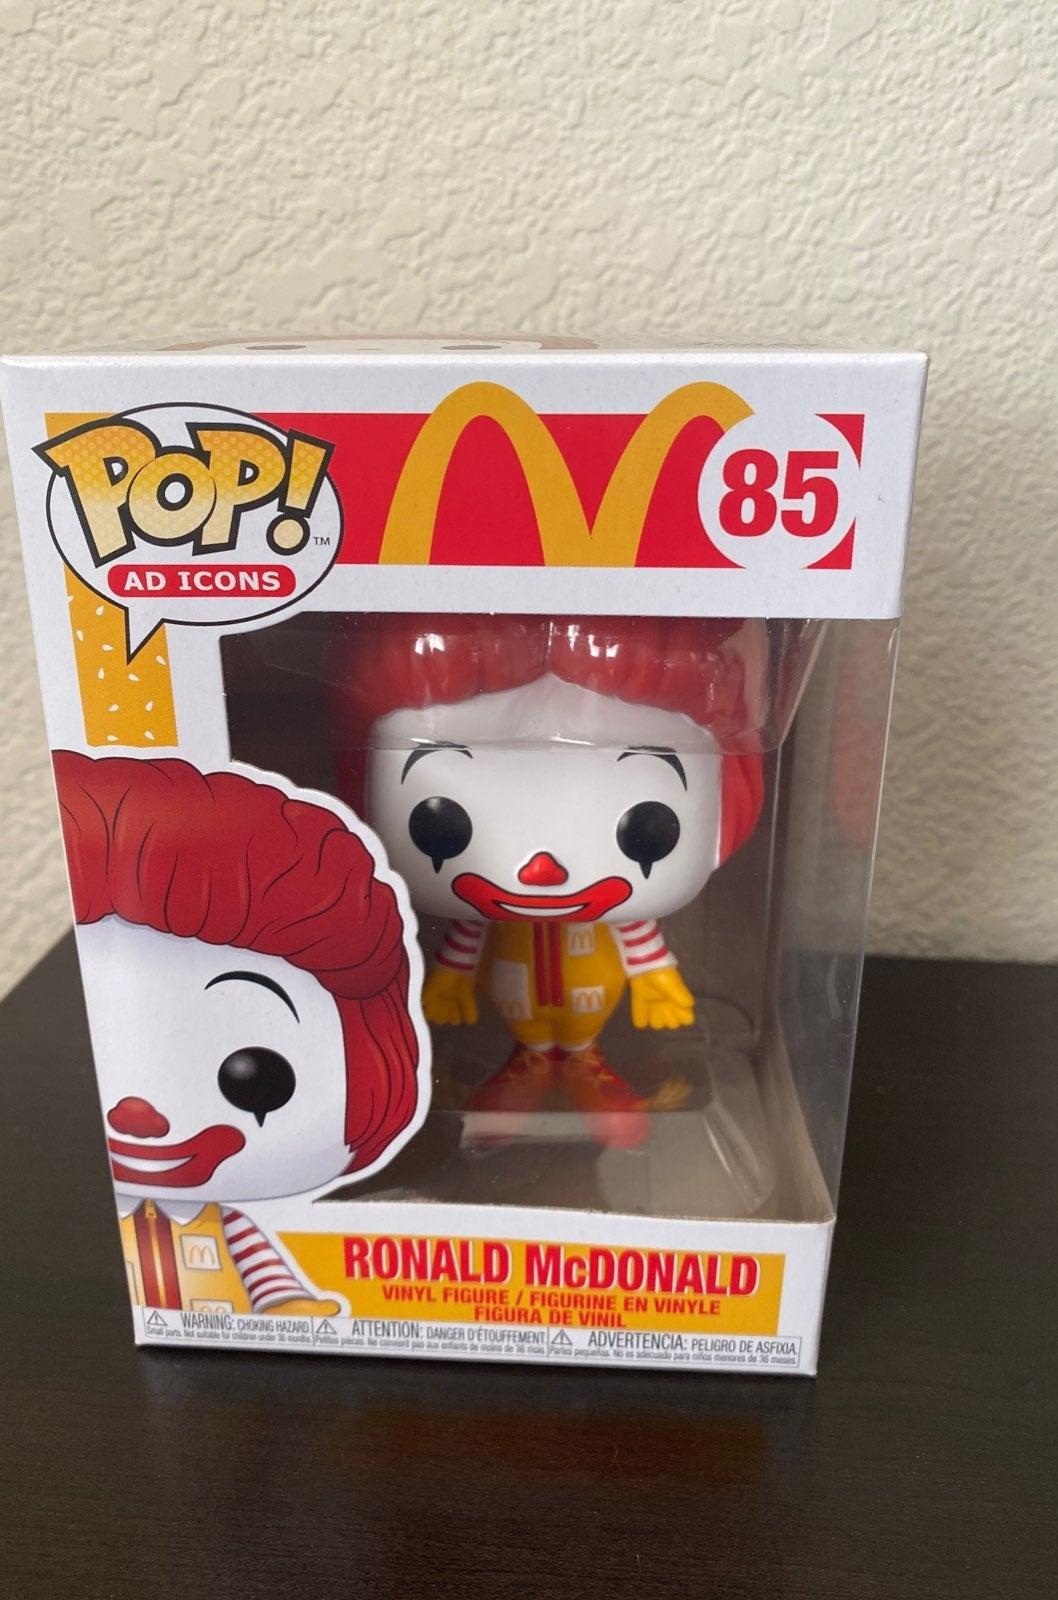 Ronald McDonald Funko Pop